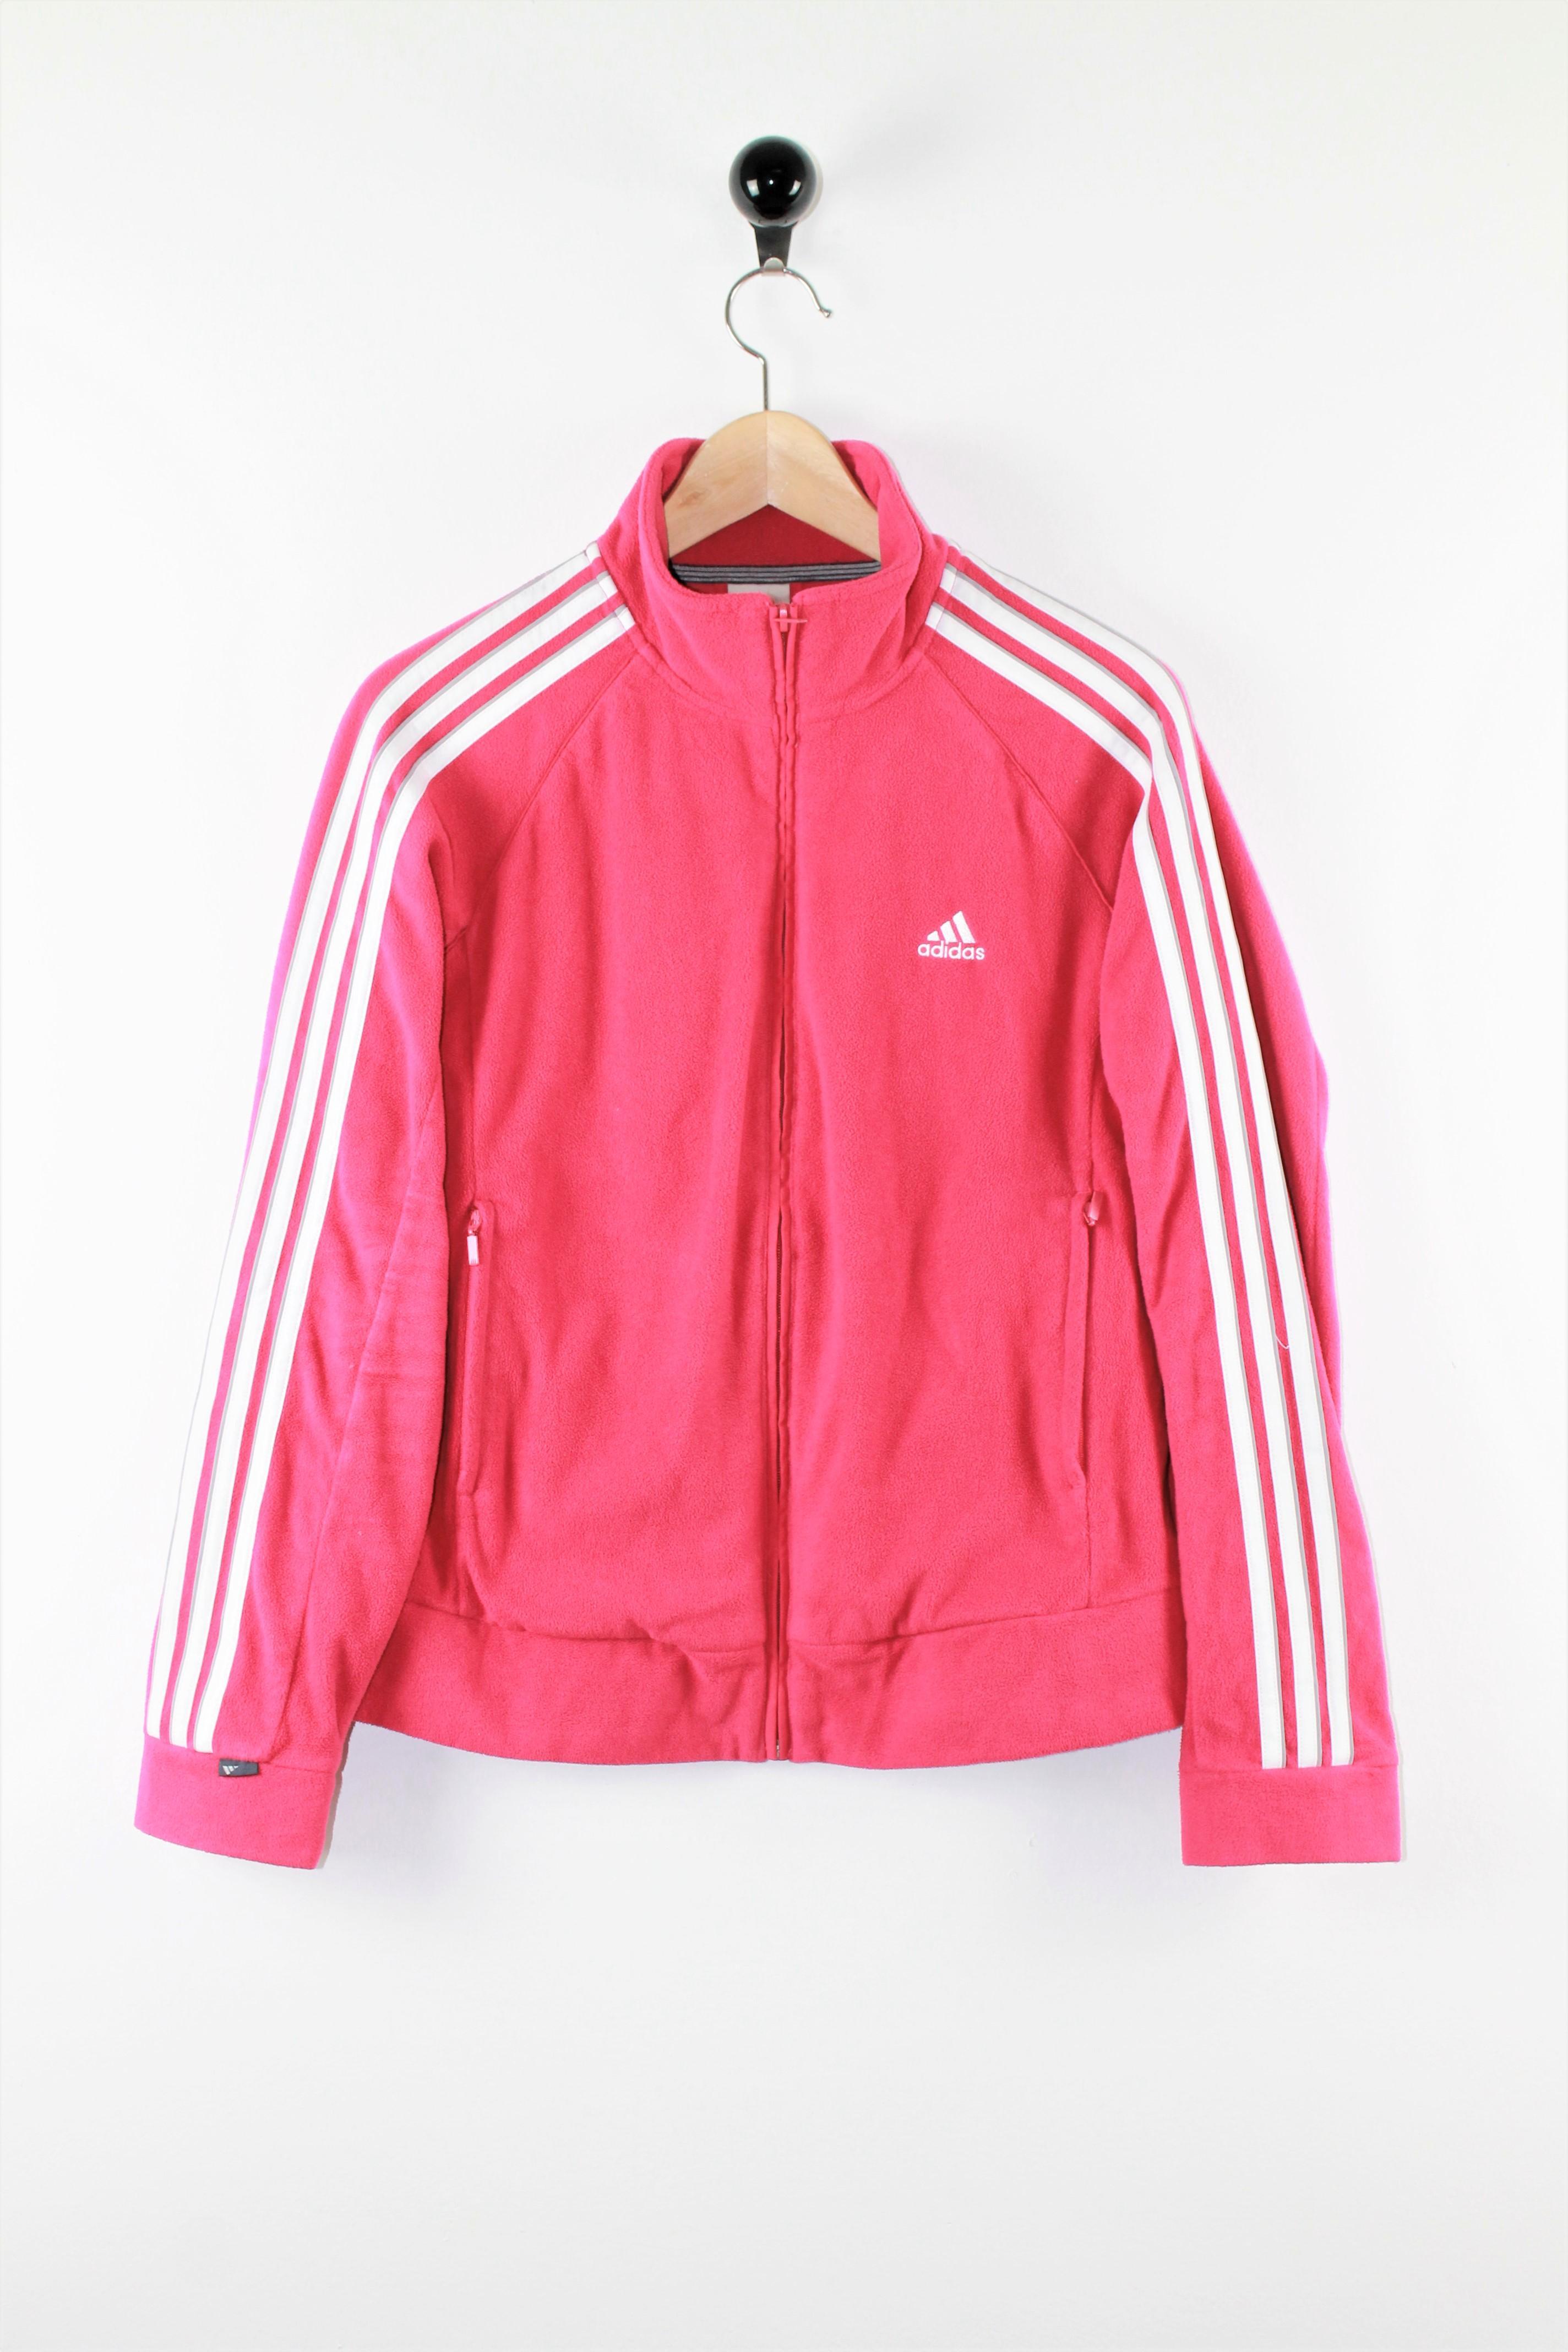 Adidas - Pile